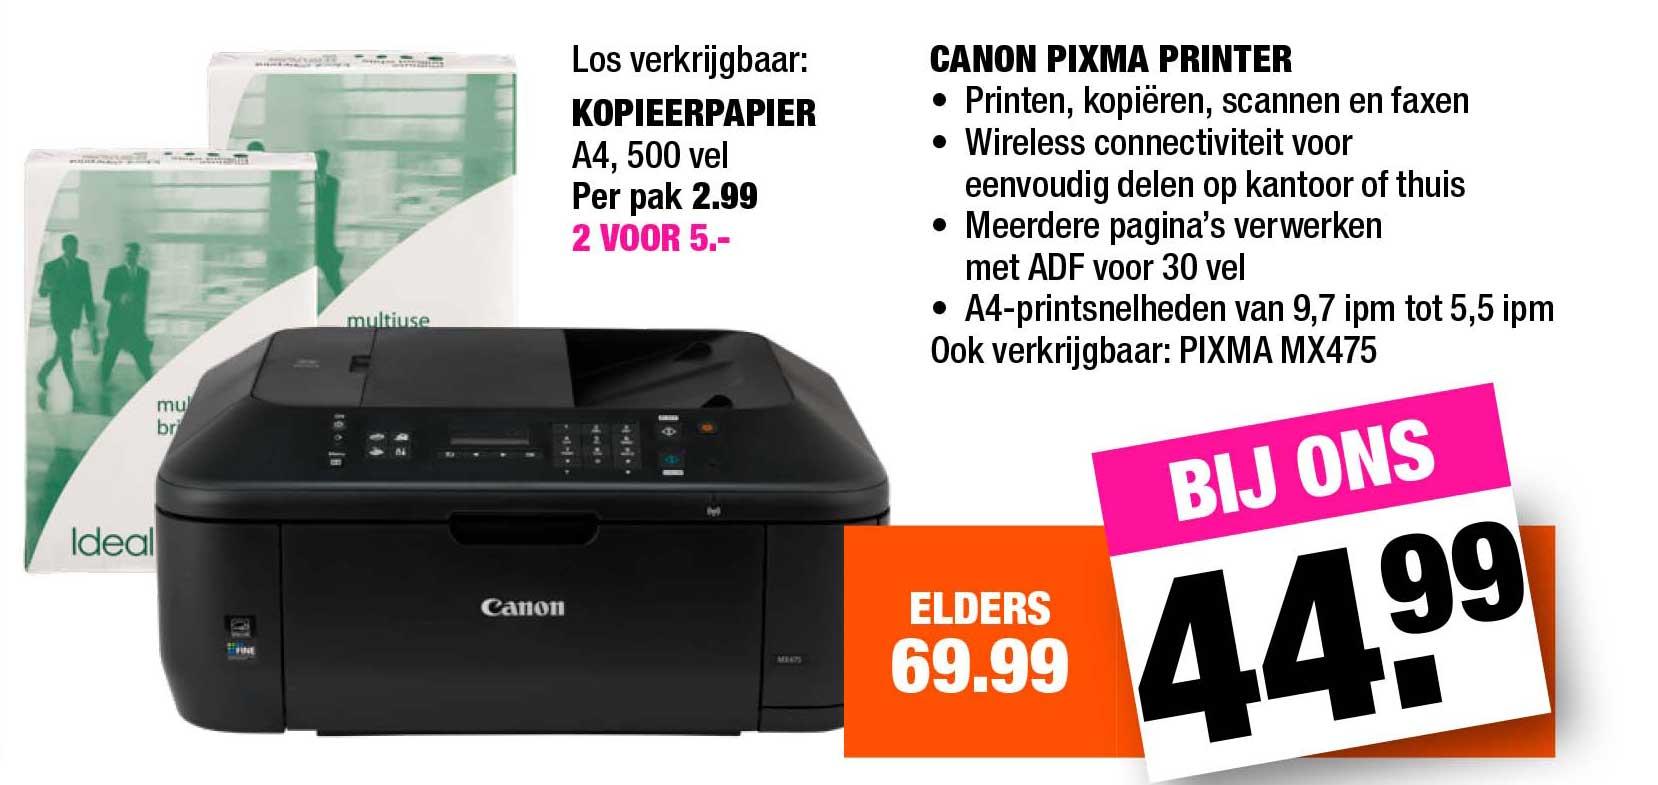 Big Bazar Canon Pixma Printer